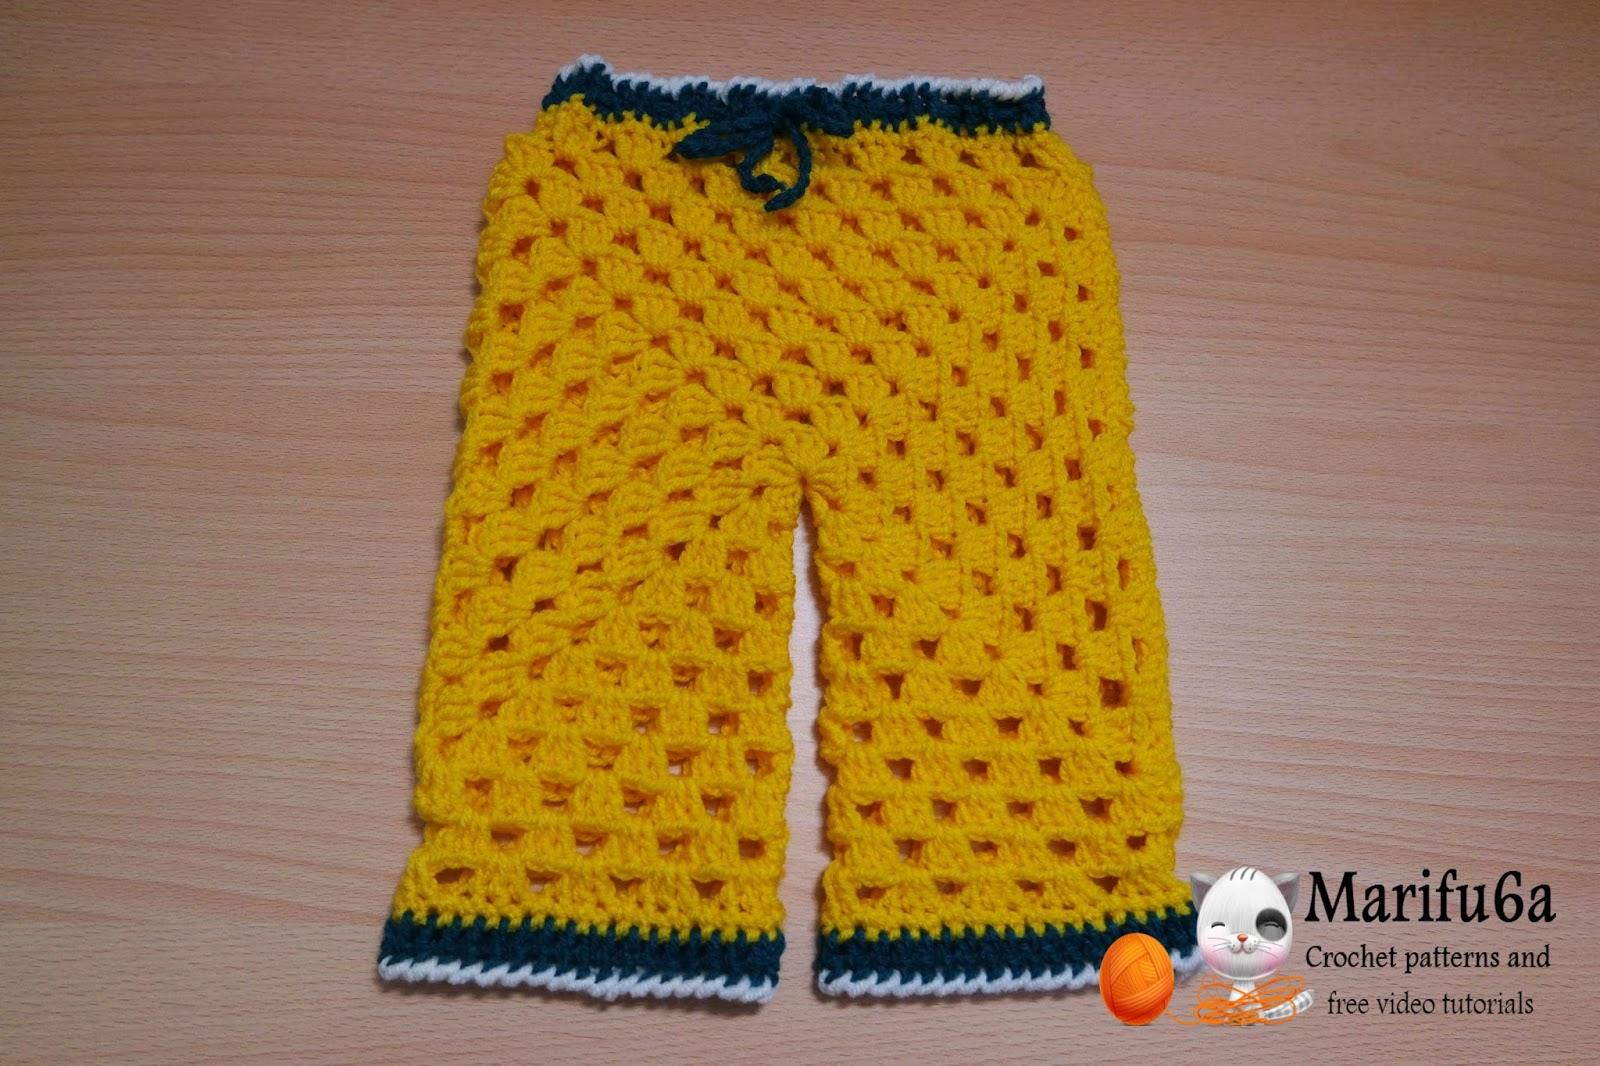 Crochet Baby Jacket Tutorial : Free crochet patterns and video tutorials: how to crochet ...